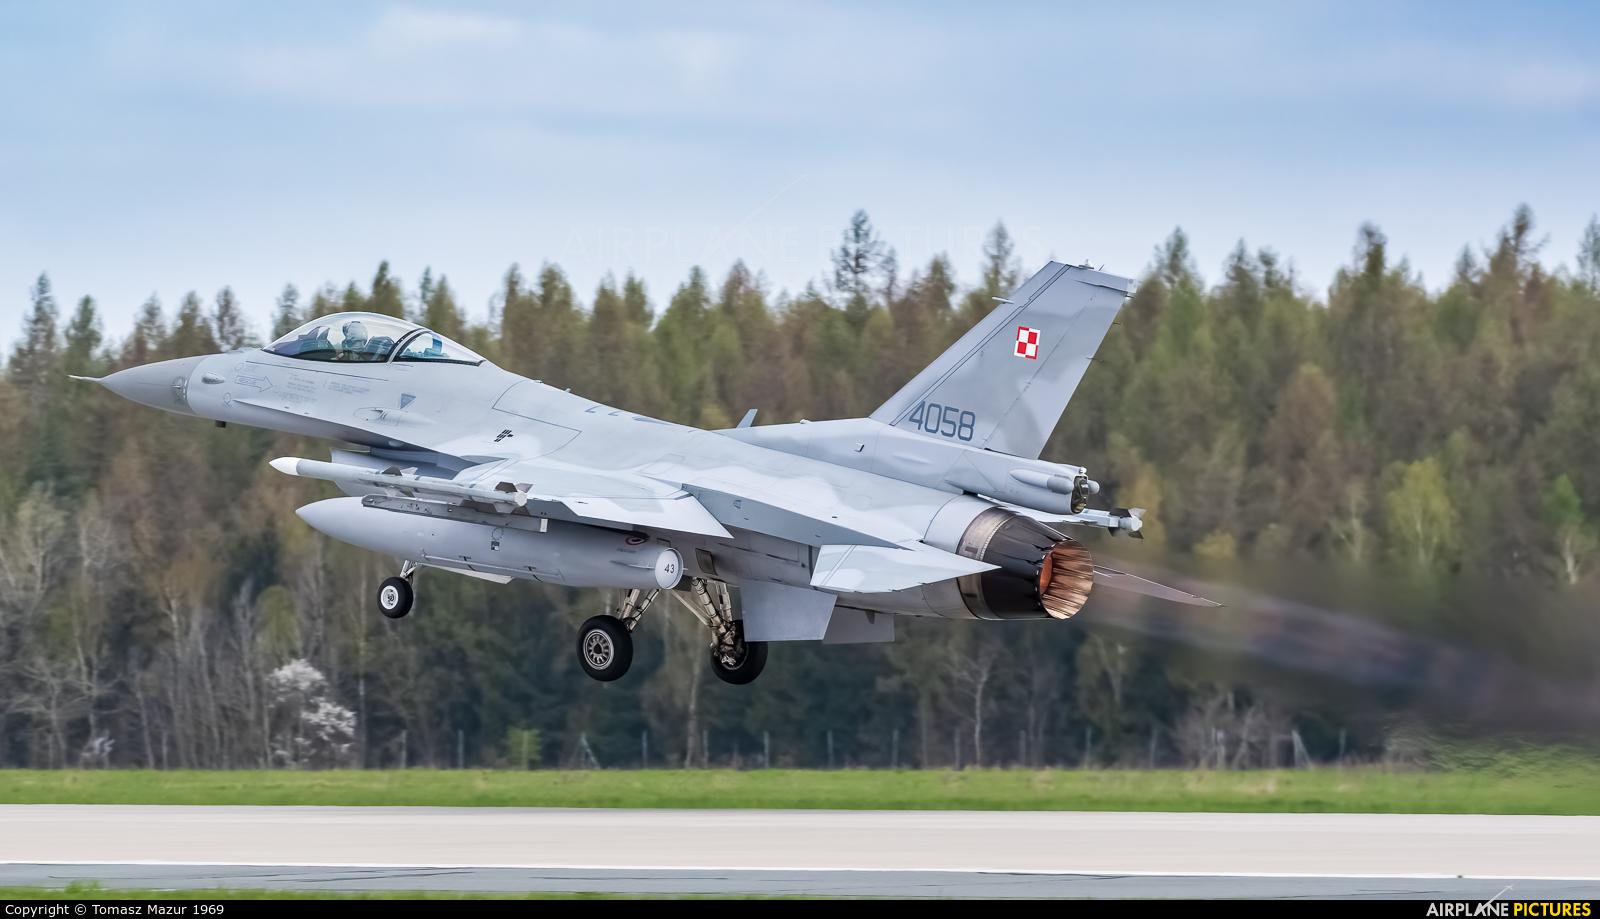 Poland - Air Force 4058 aircraft at Poznań - Krzesiny